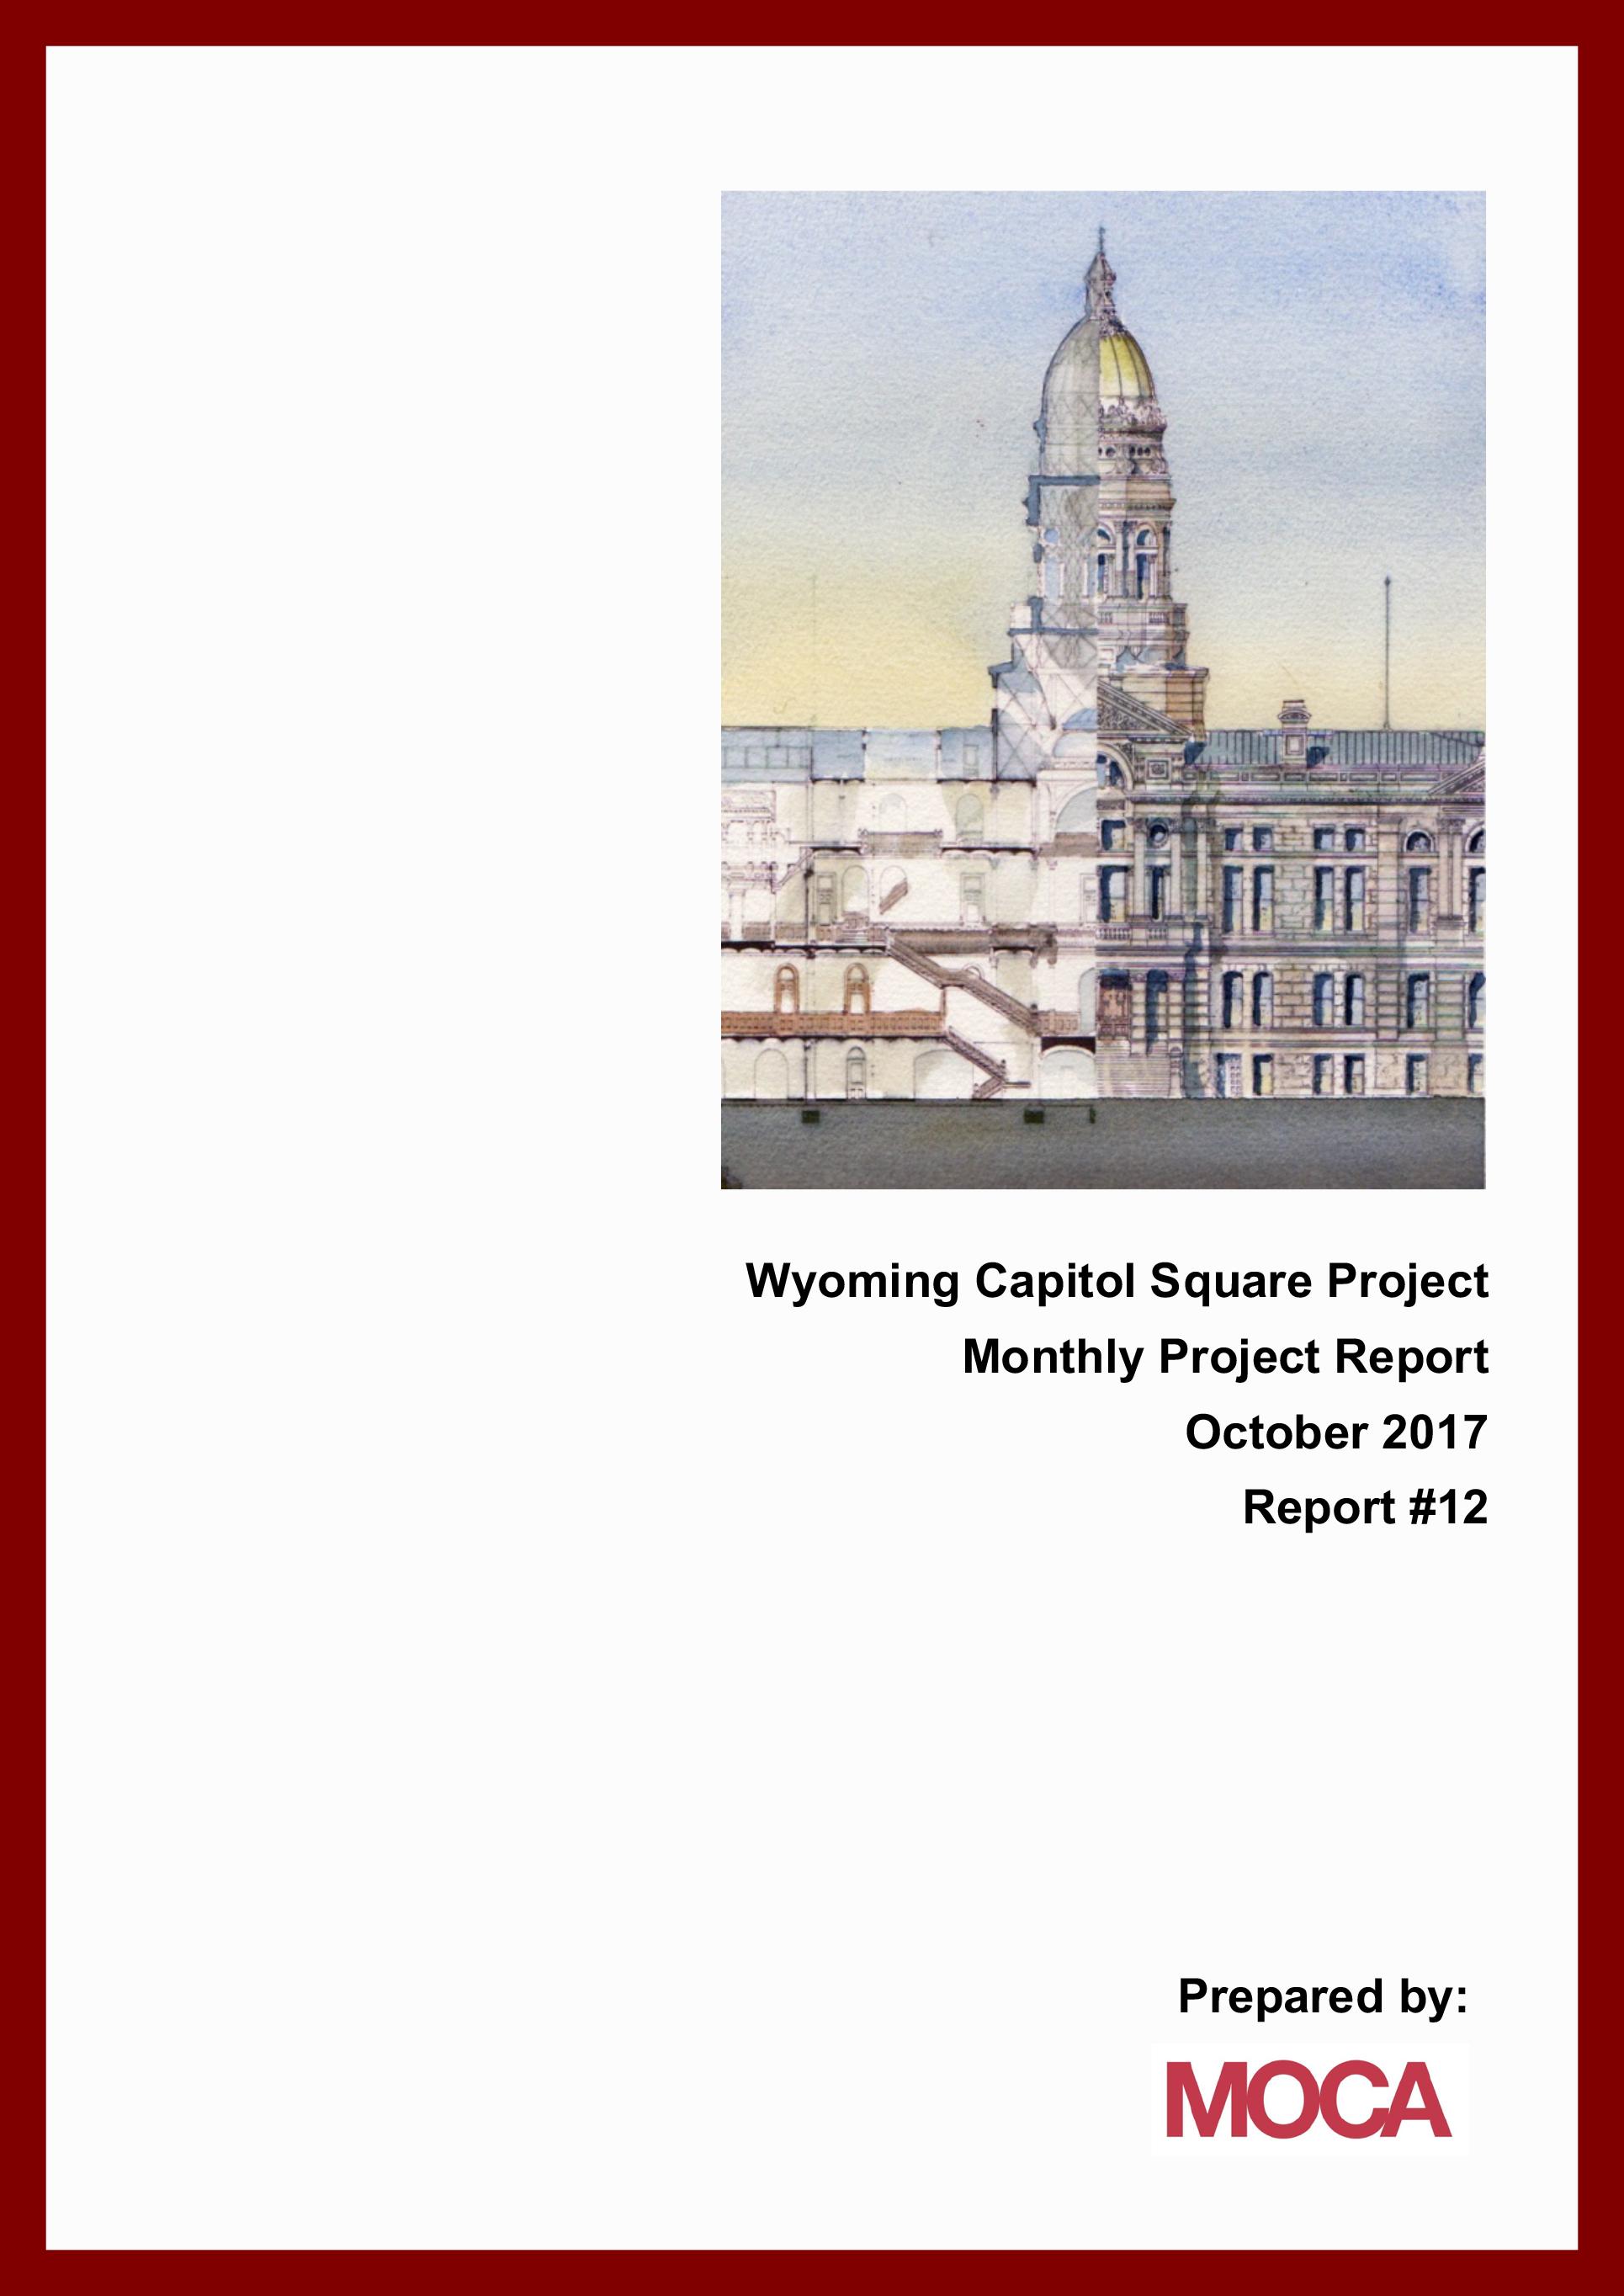 2017-1031-WyomingCapitolMonthlyReport-Final-12.jpg